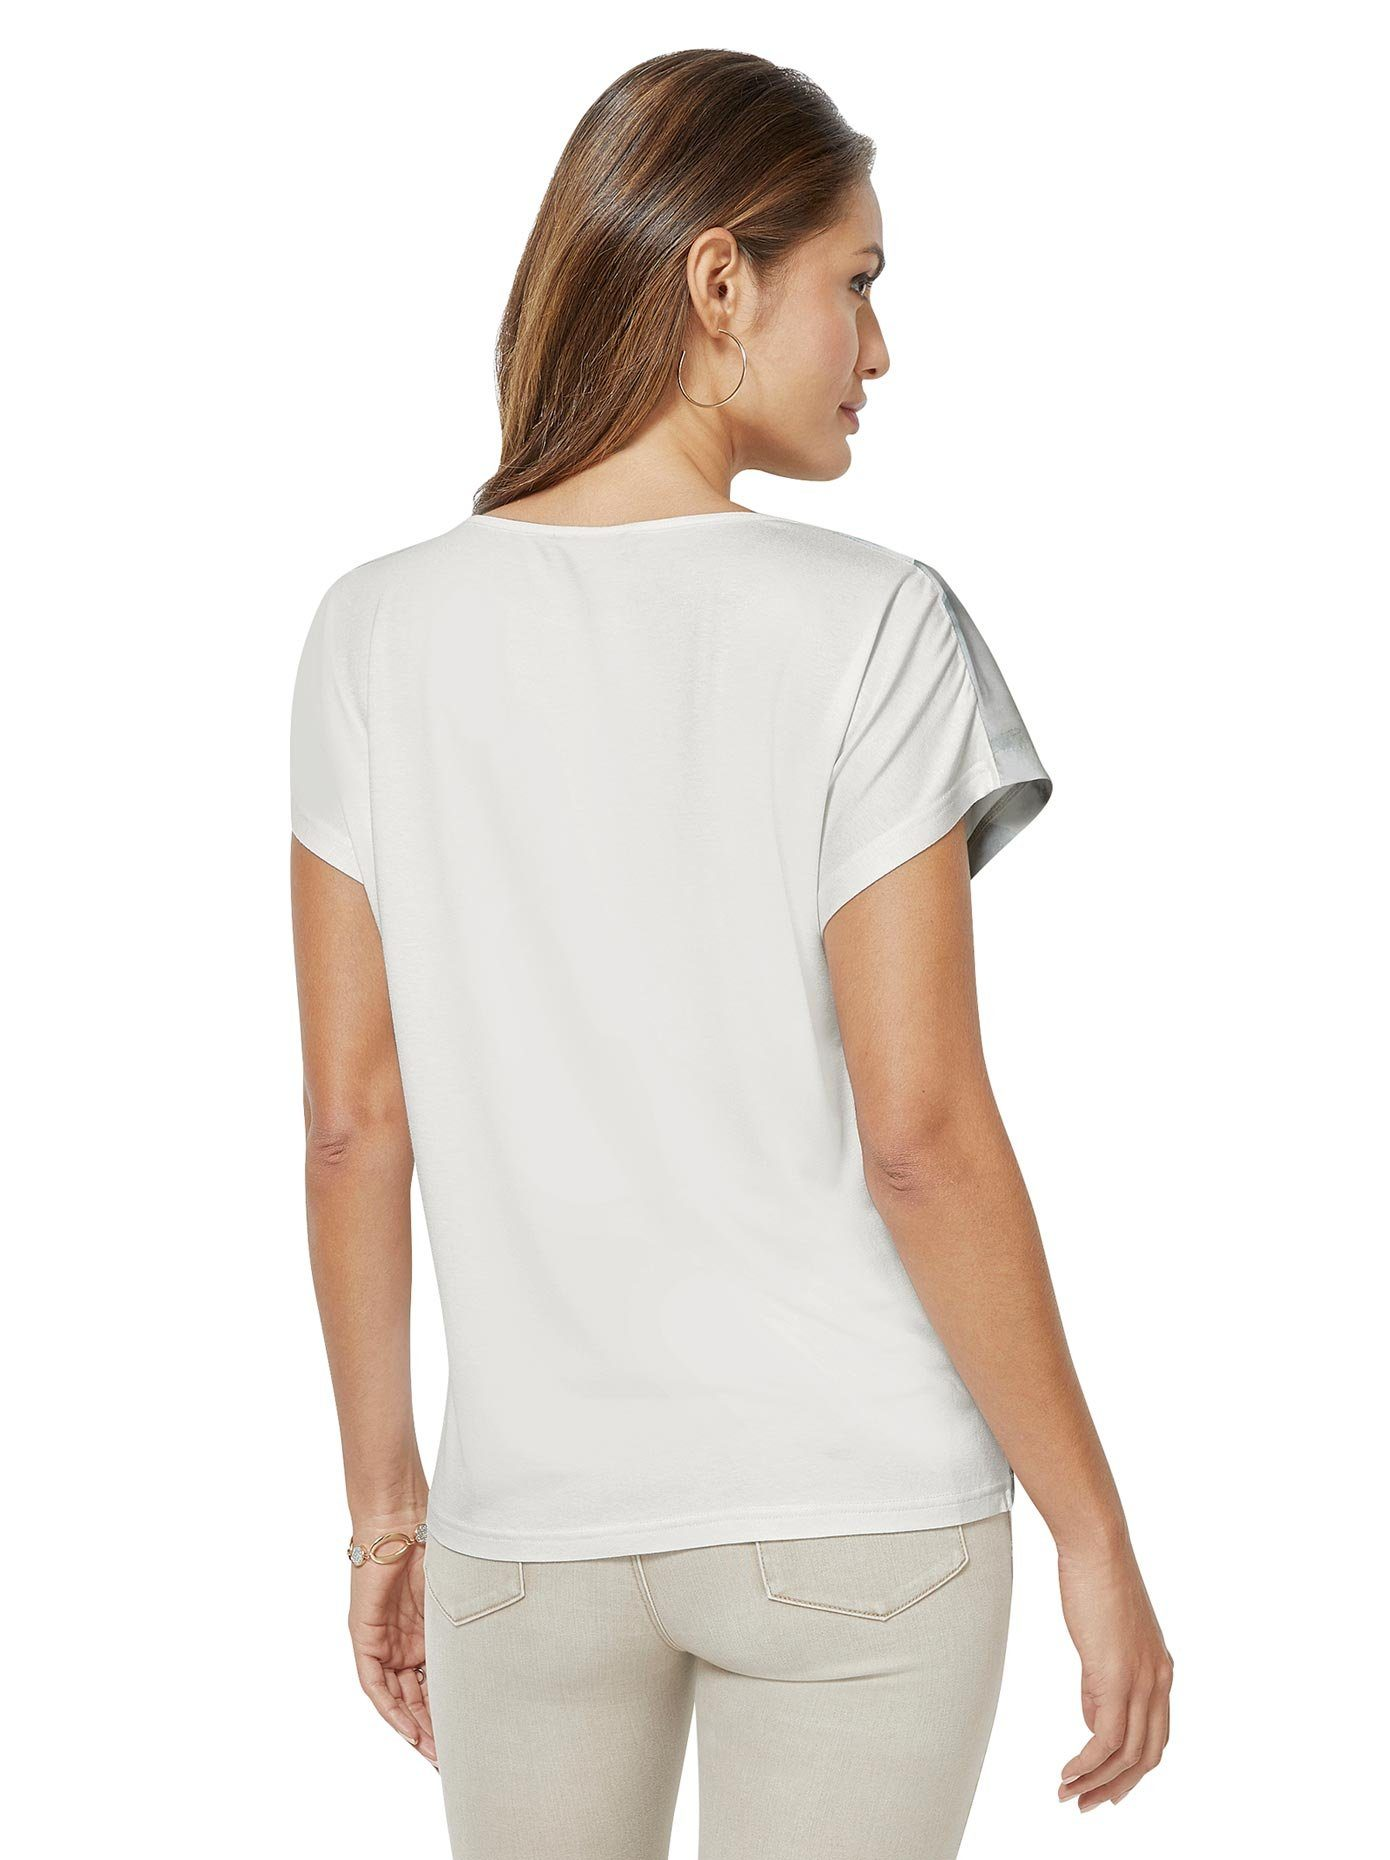 creation L Print-Shirt, floraler Druck